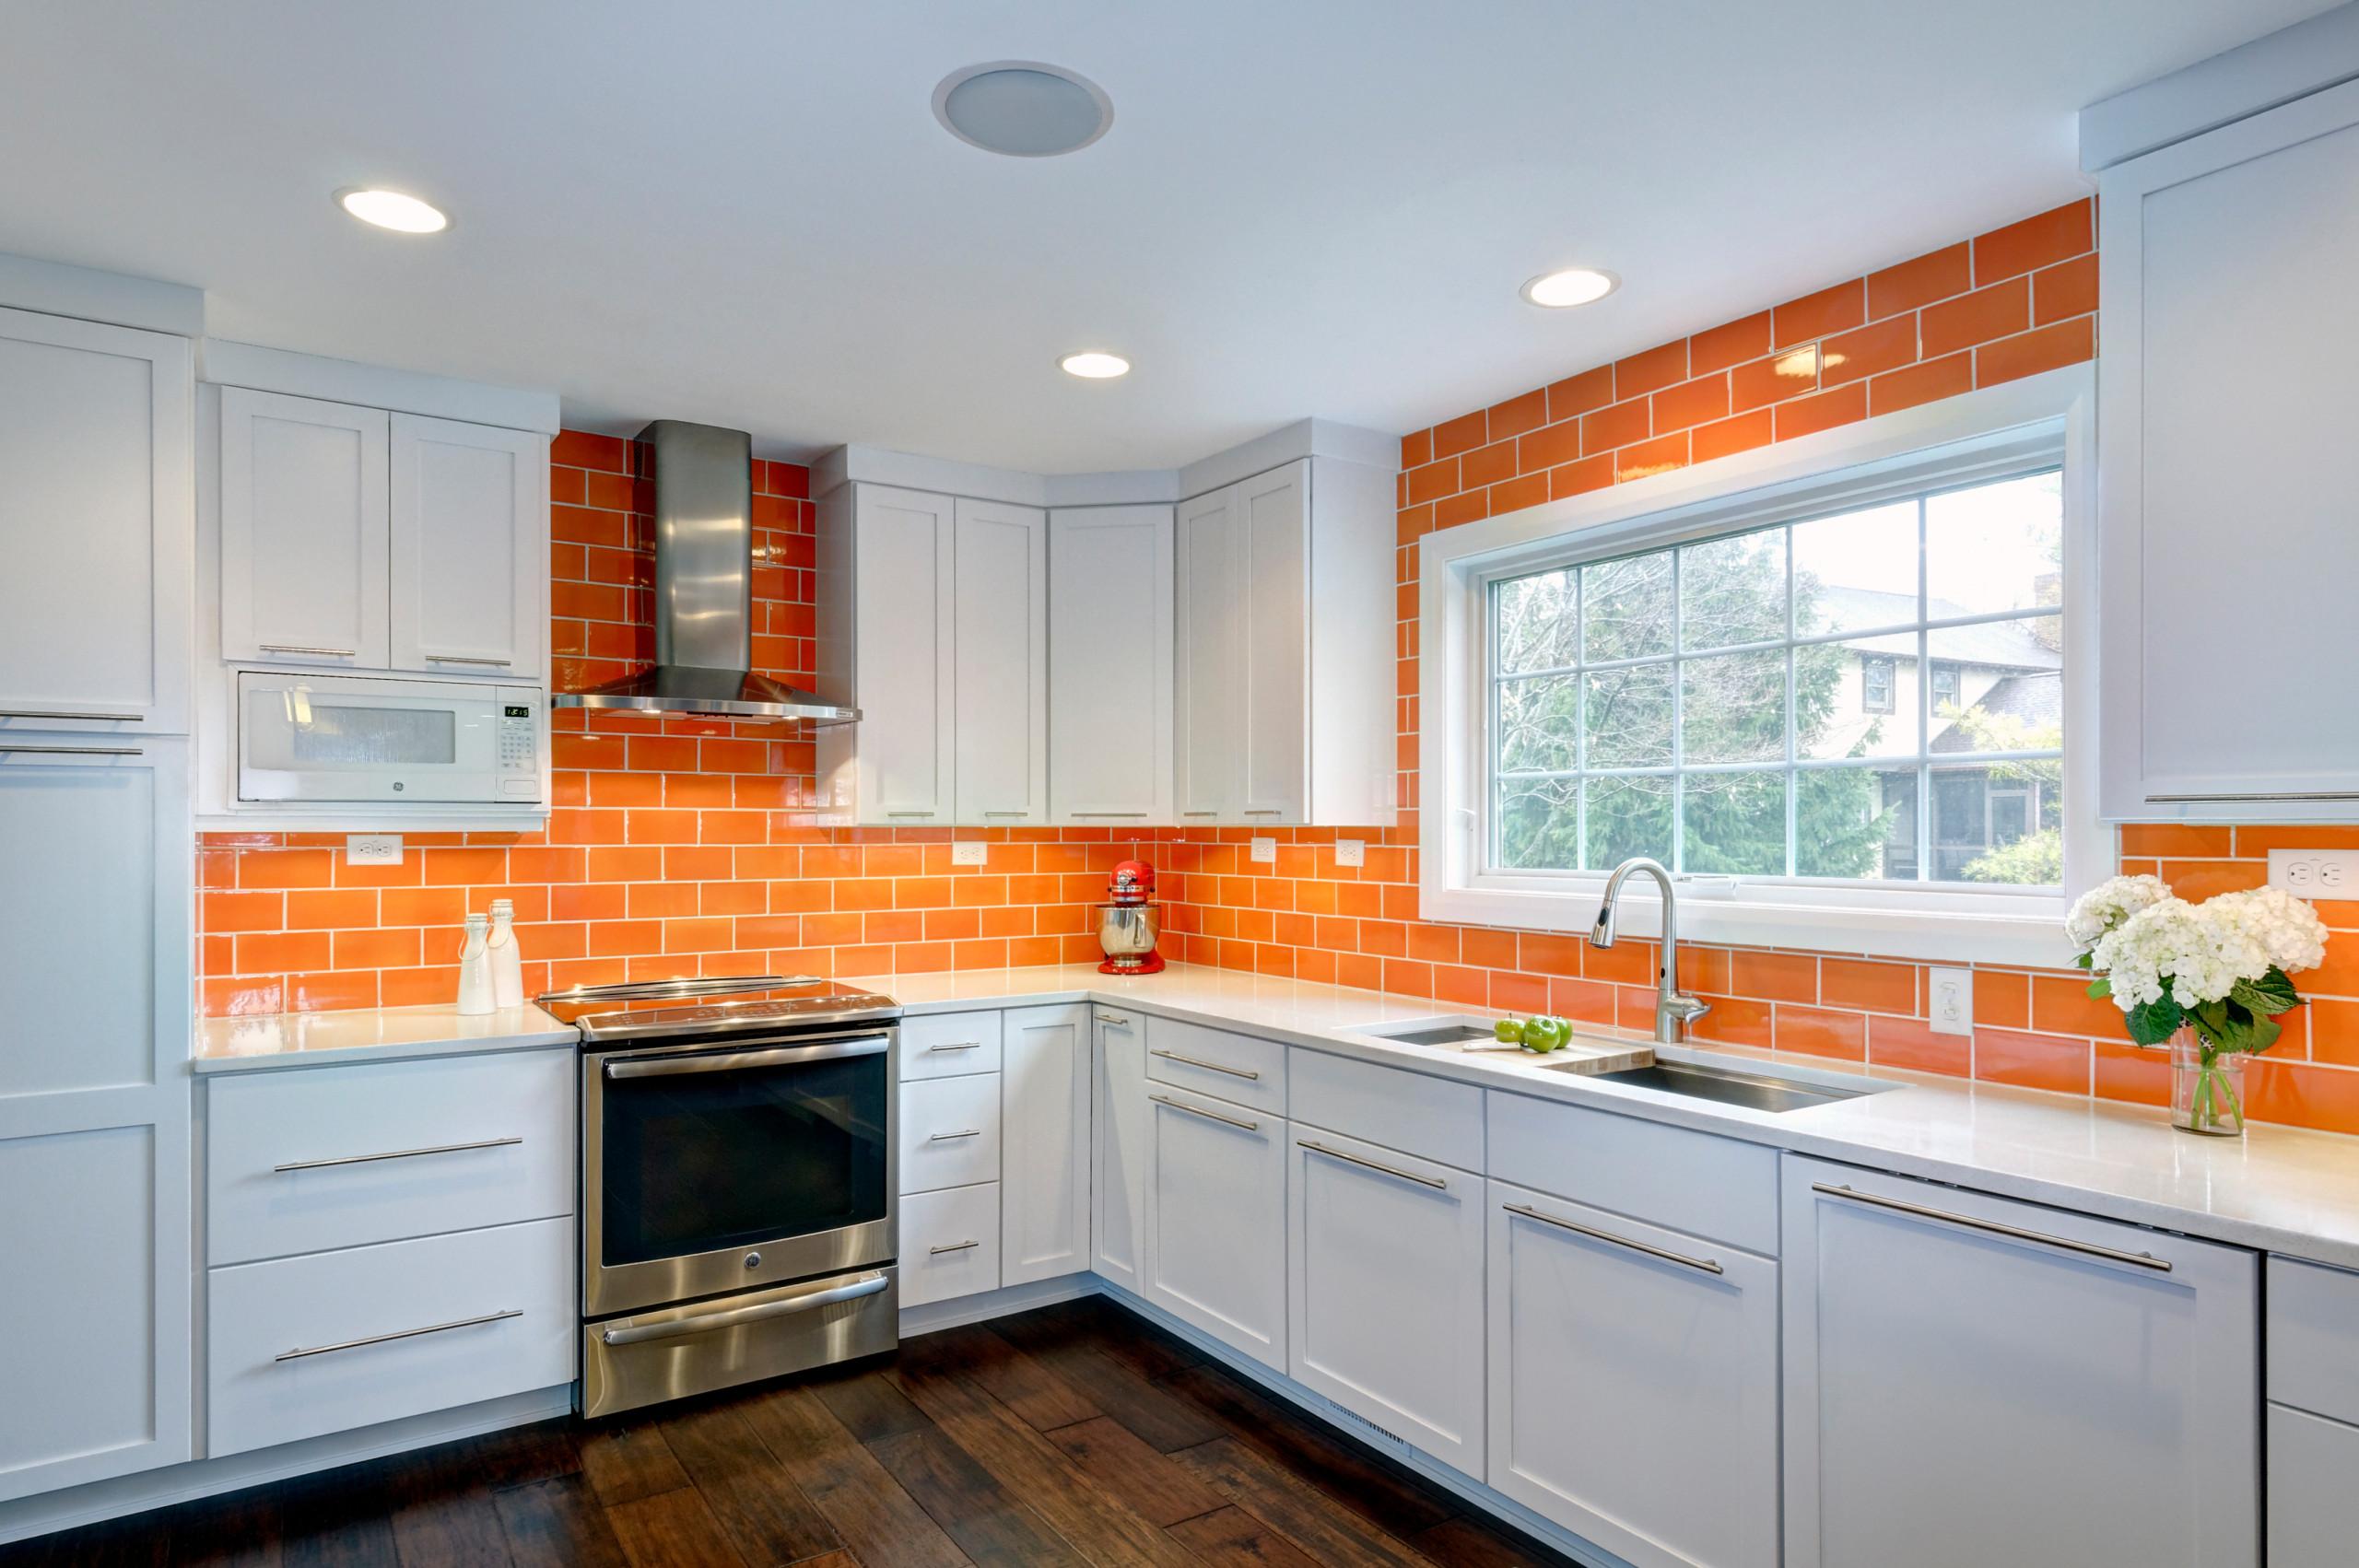 75 Beautiful Gray Kitchen With Orange Backsplash Pictures Ideas April 2021 Houzz